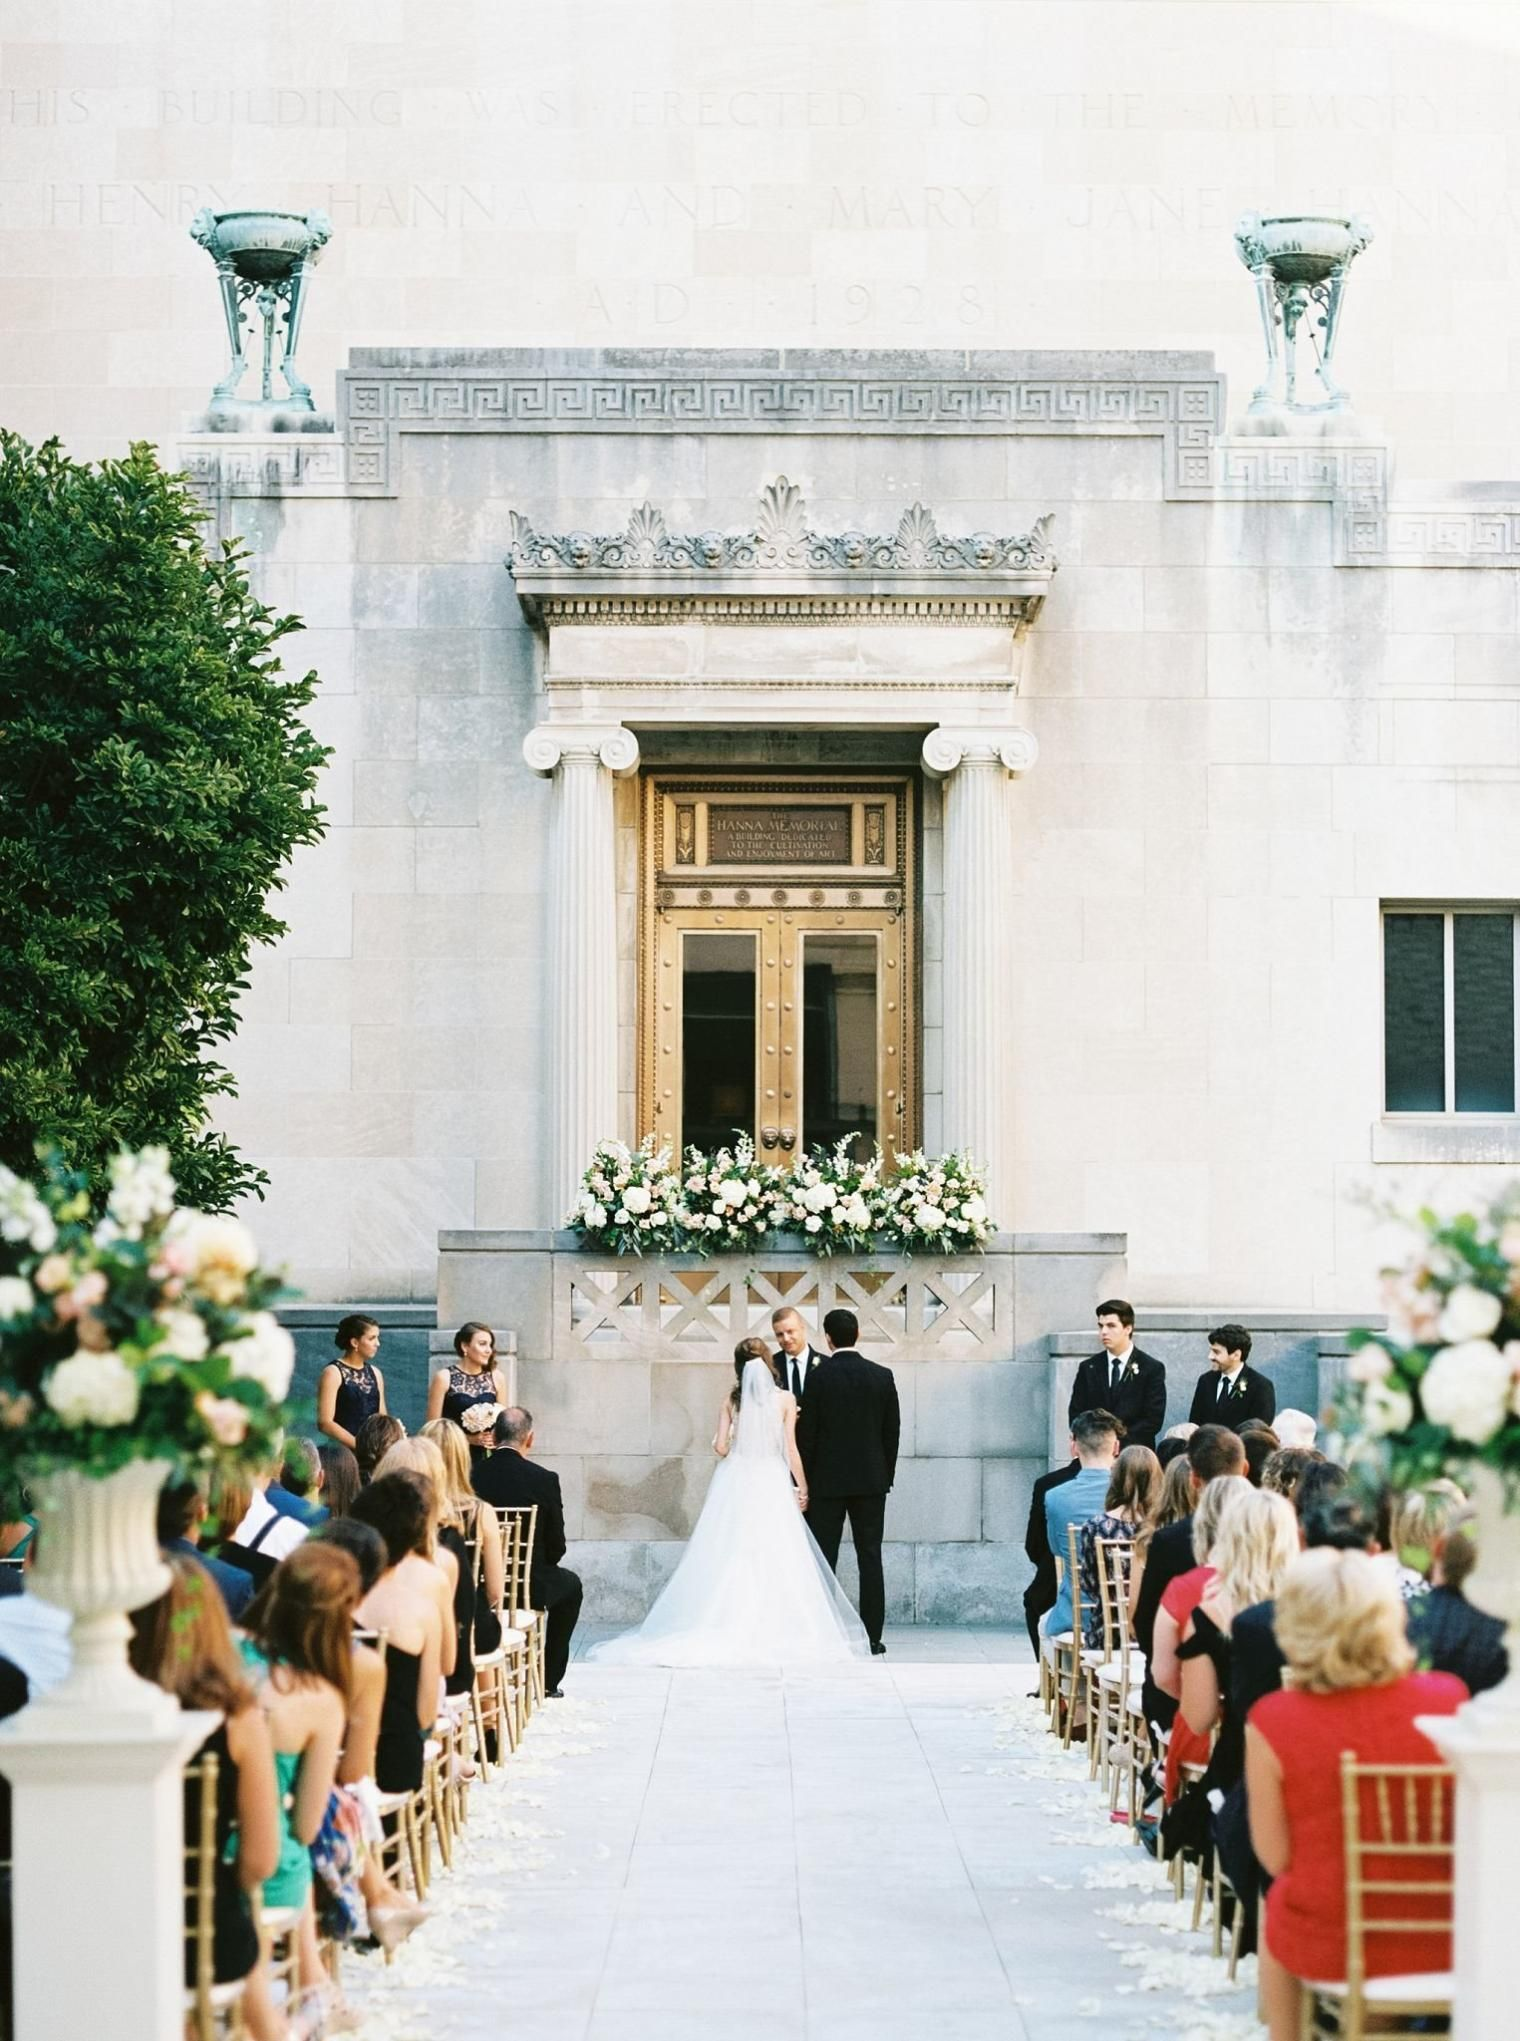 outdoor wedding venues in cleveland ohio